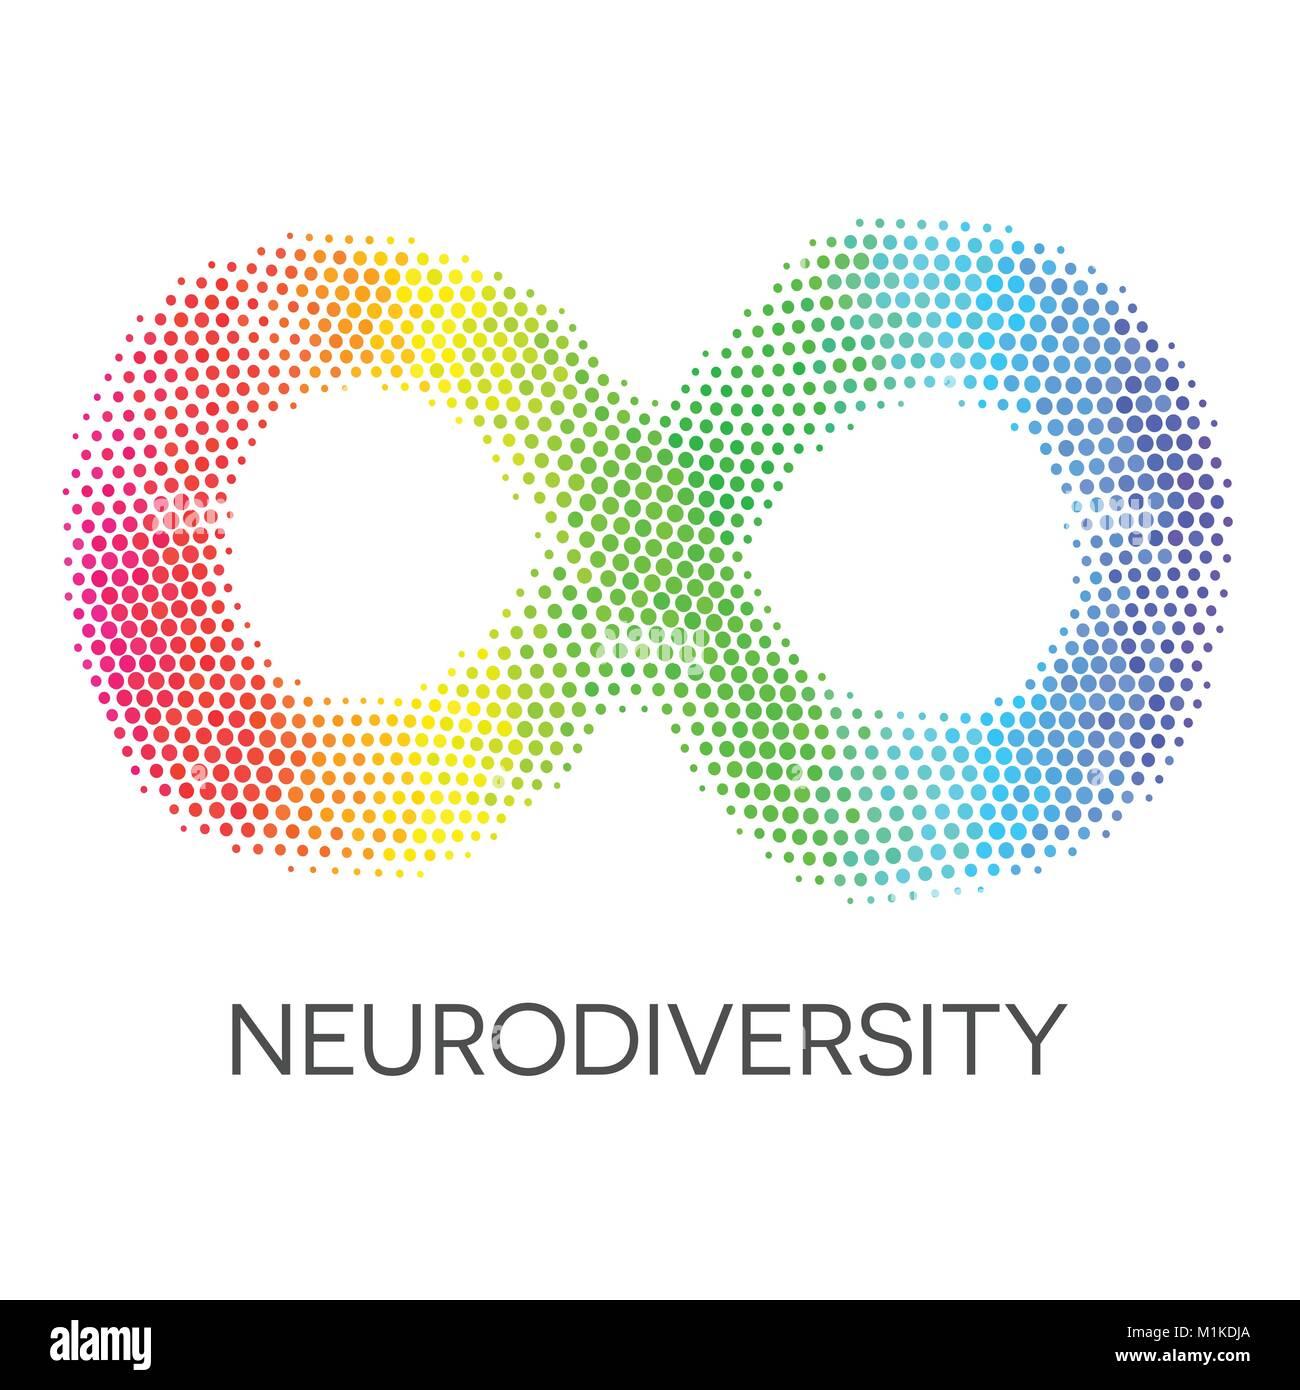 Rainbow Infinity Sign Colorful Symbol Of Neurodiversity Stock